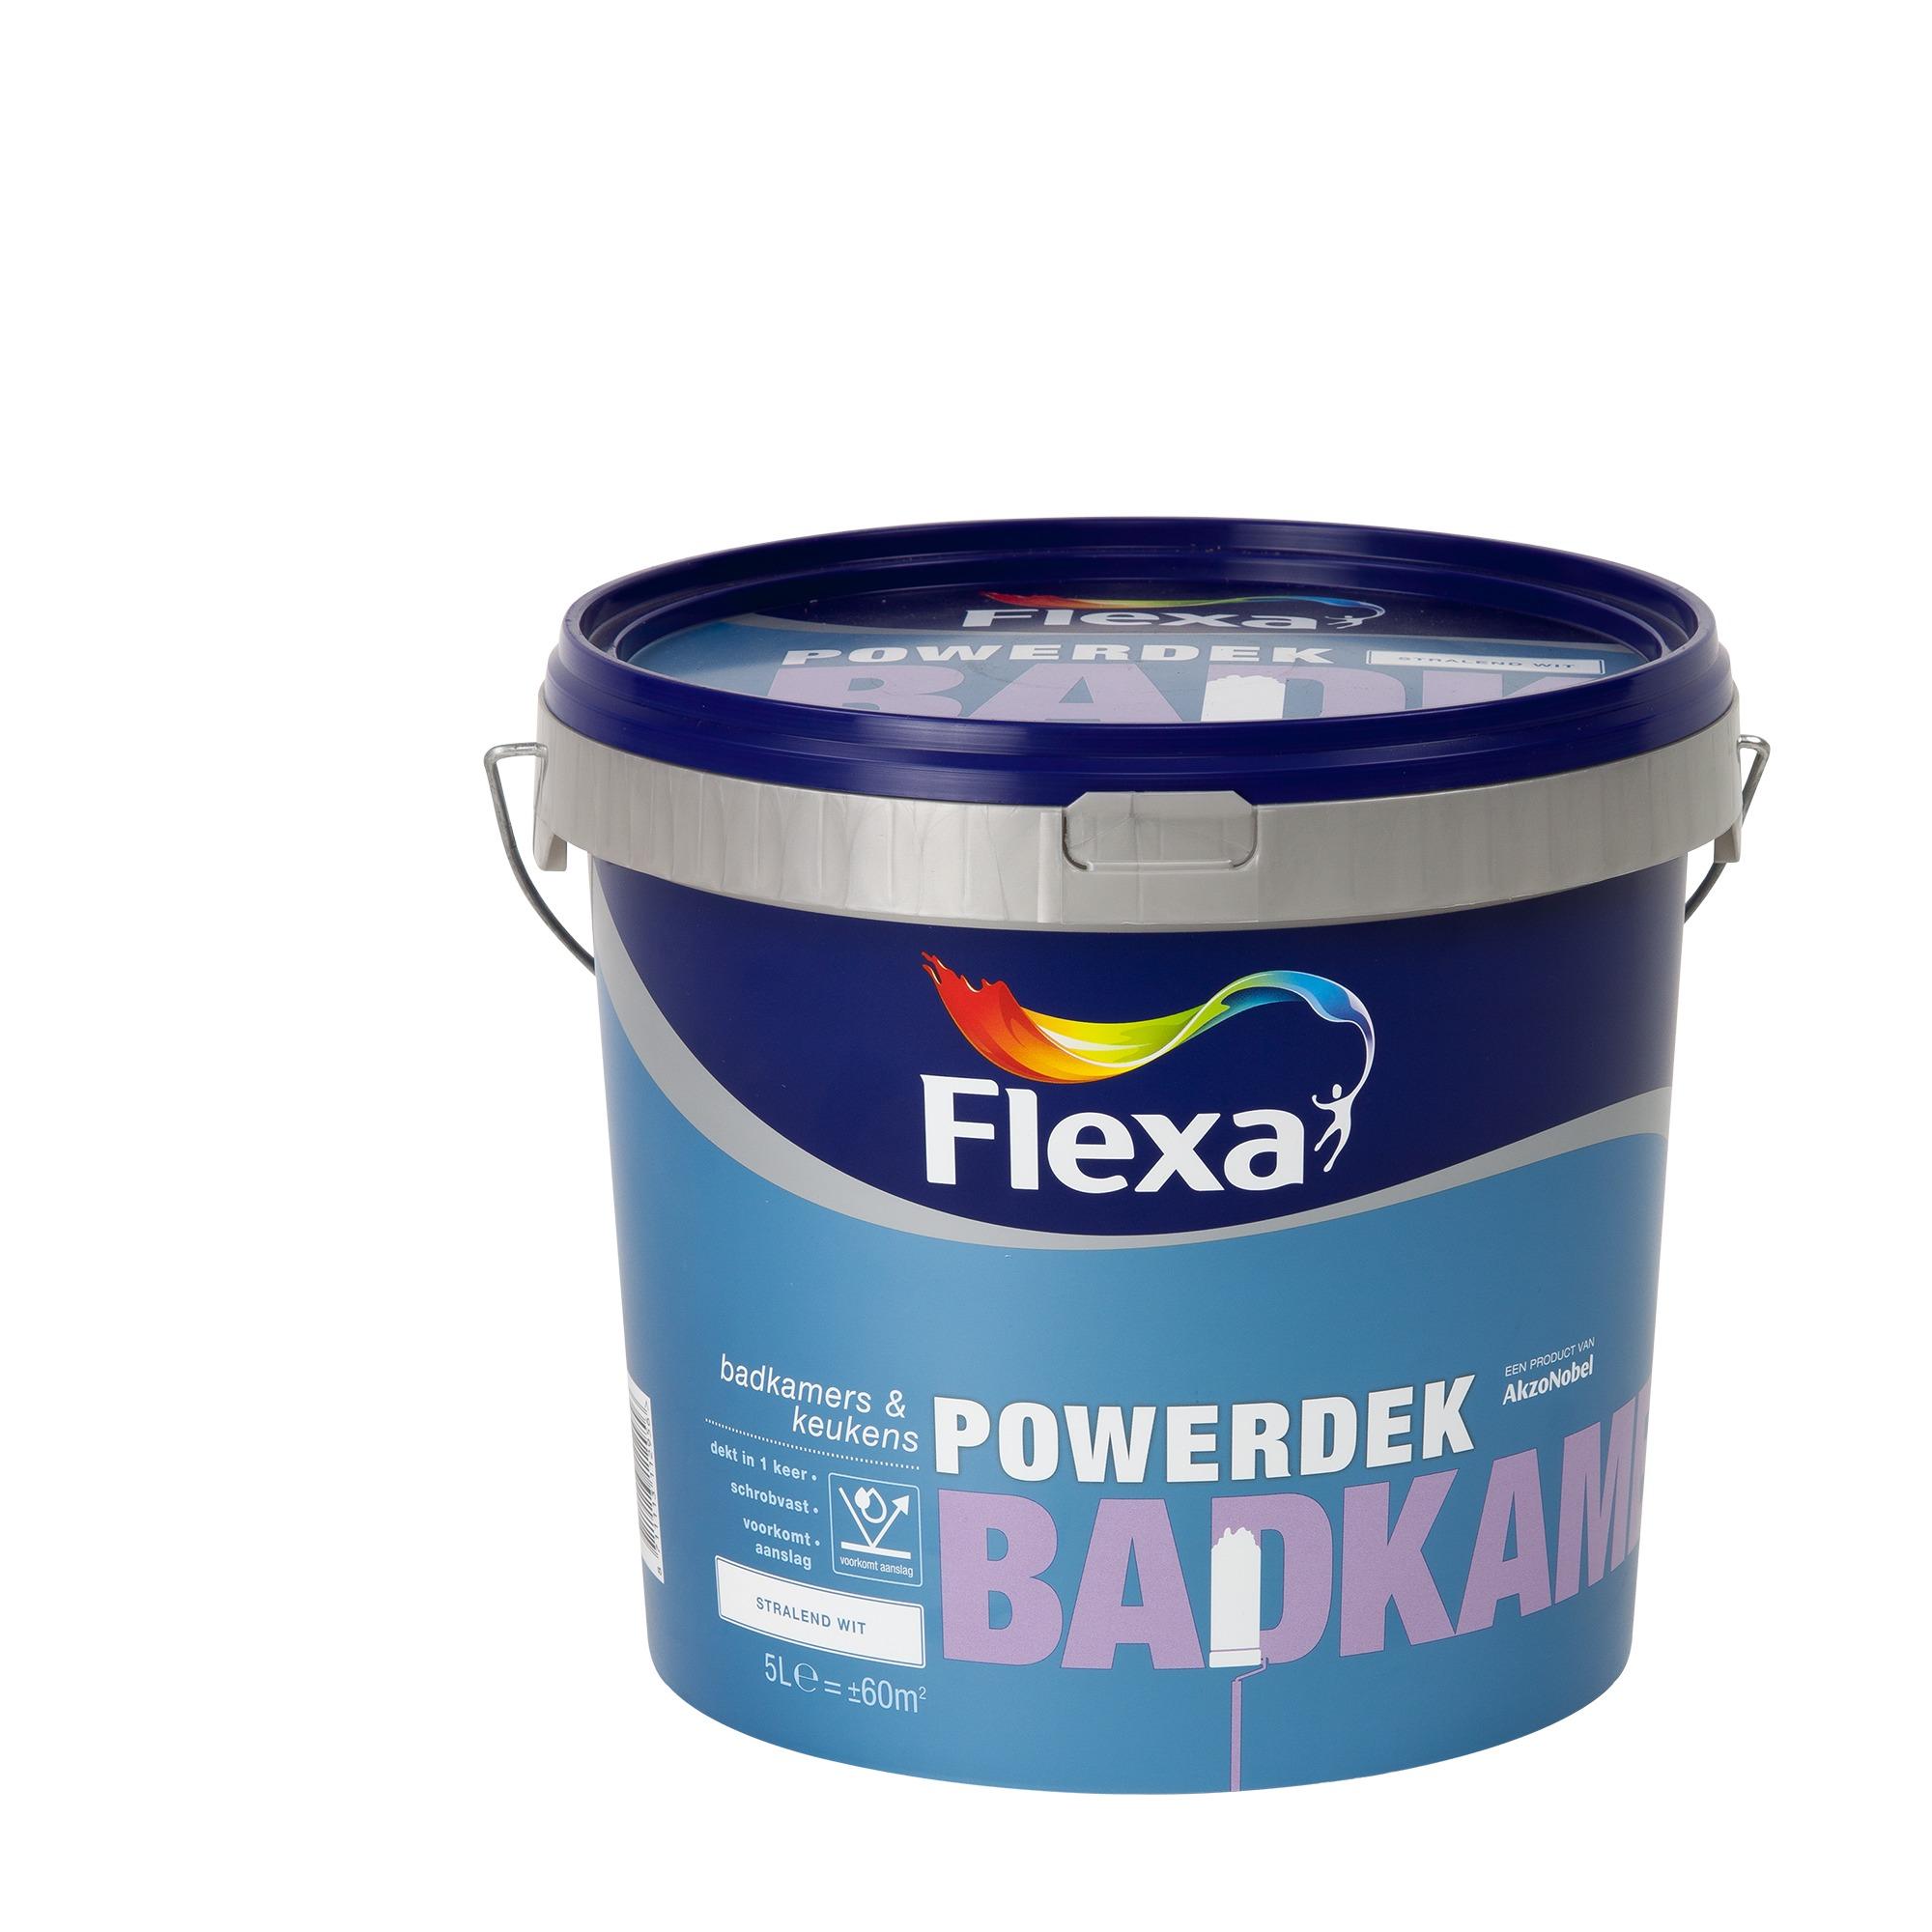 flexa powerdek latex badkamer & keuken wit mat 5 liter | muurverf, Badkamer